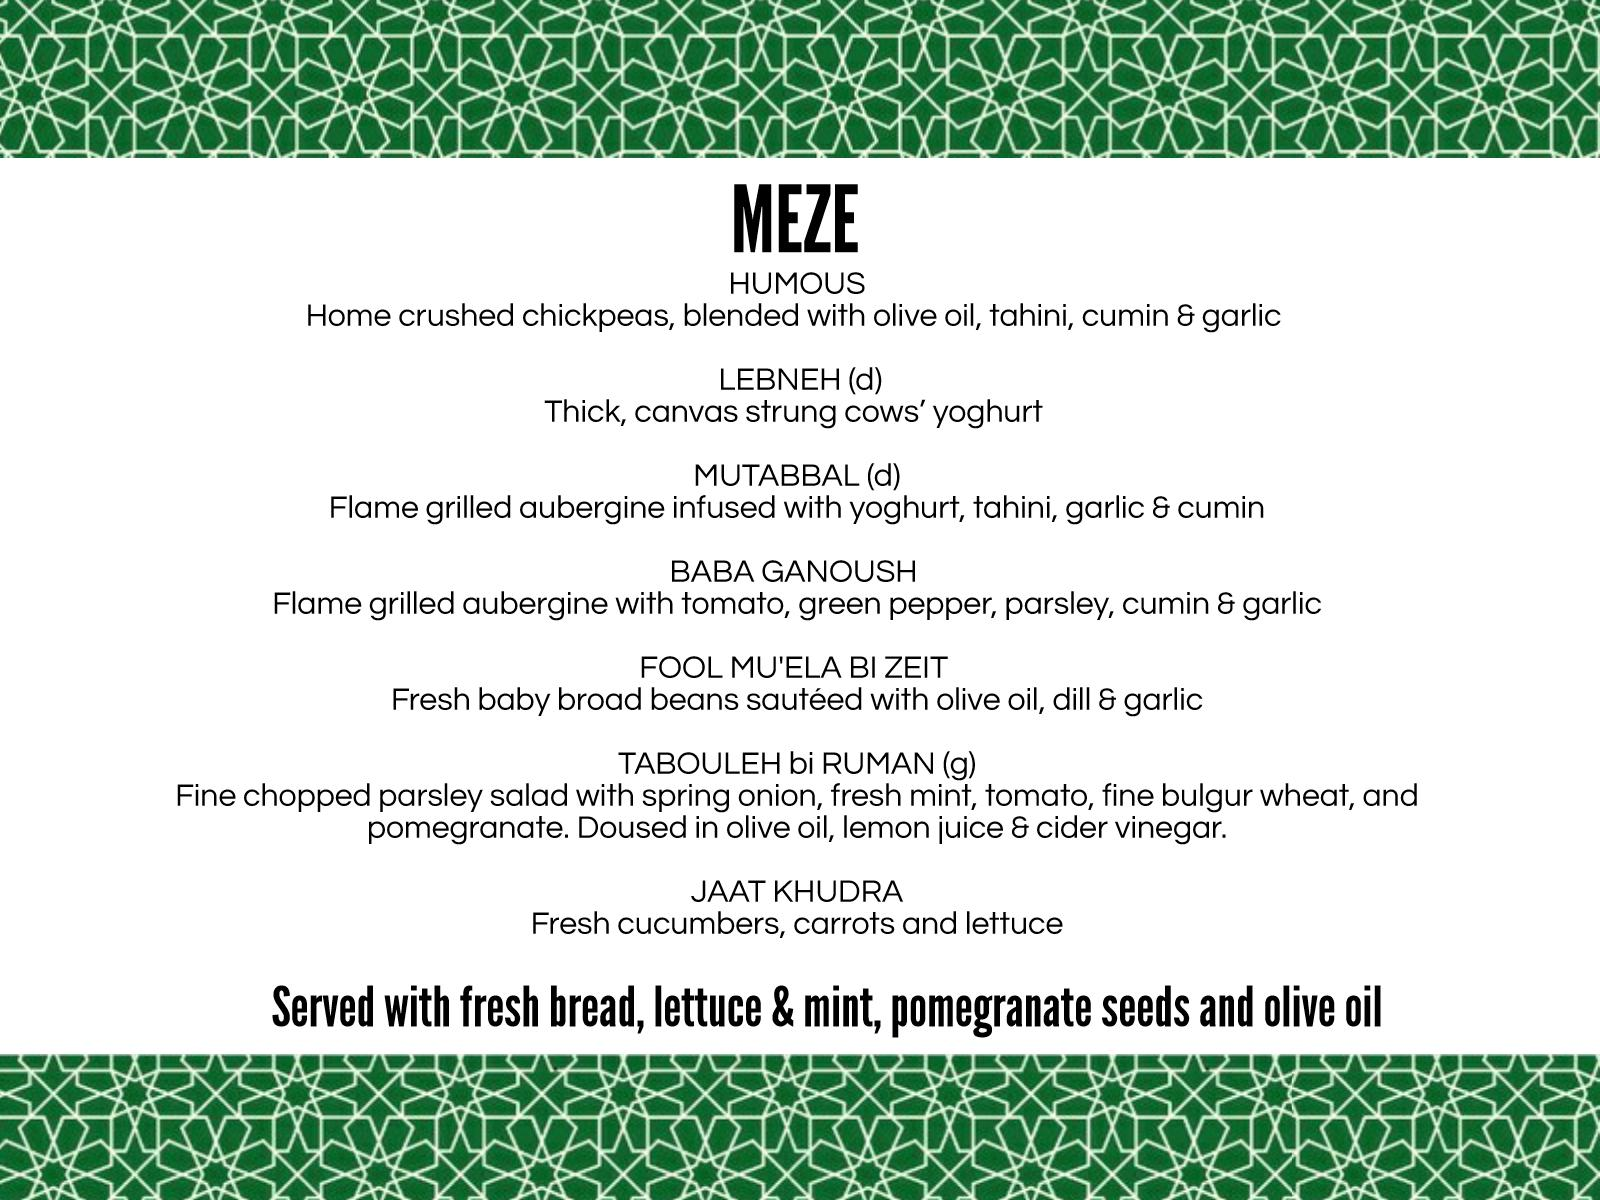 Damascus Chef Meze